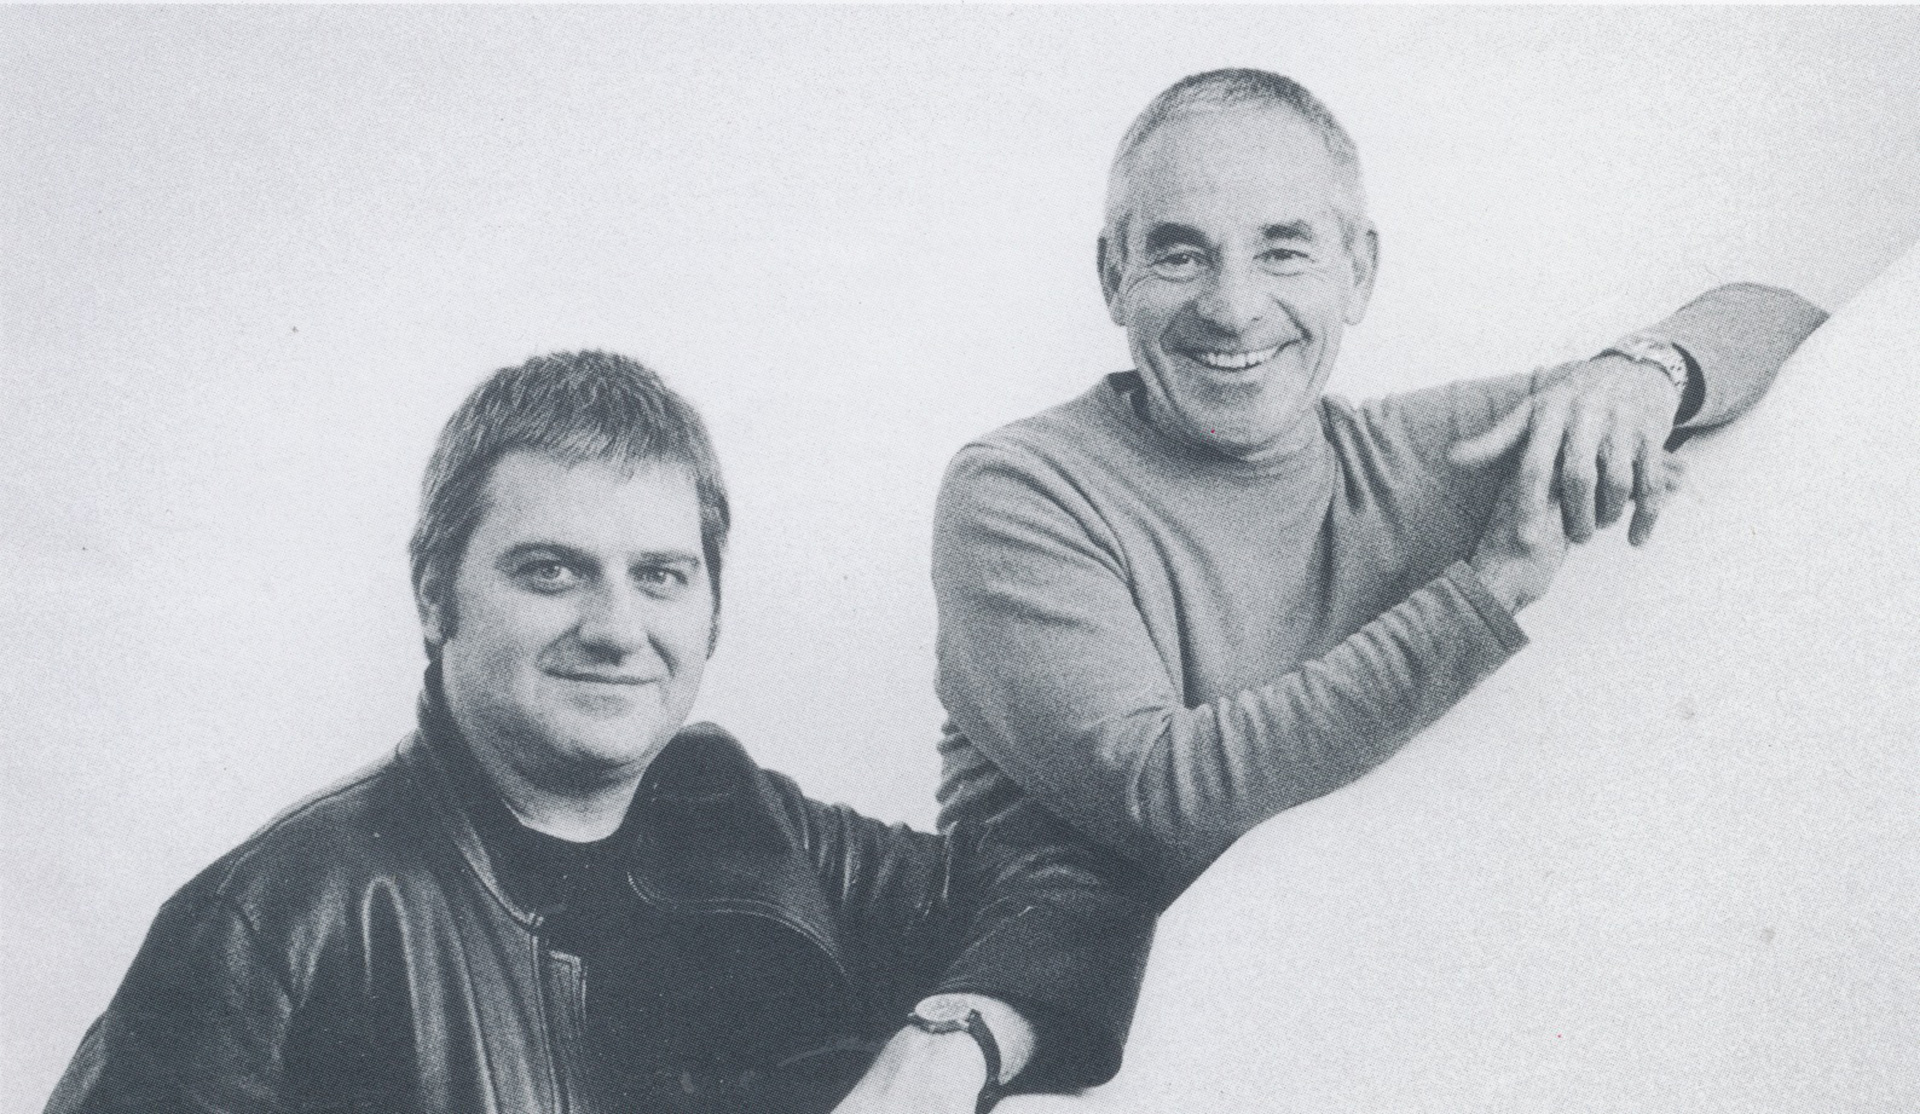 Ralph Rembel and George Freedman. Photo courtesy Freedman Rembel.